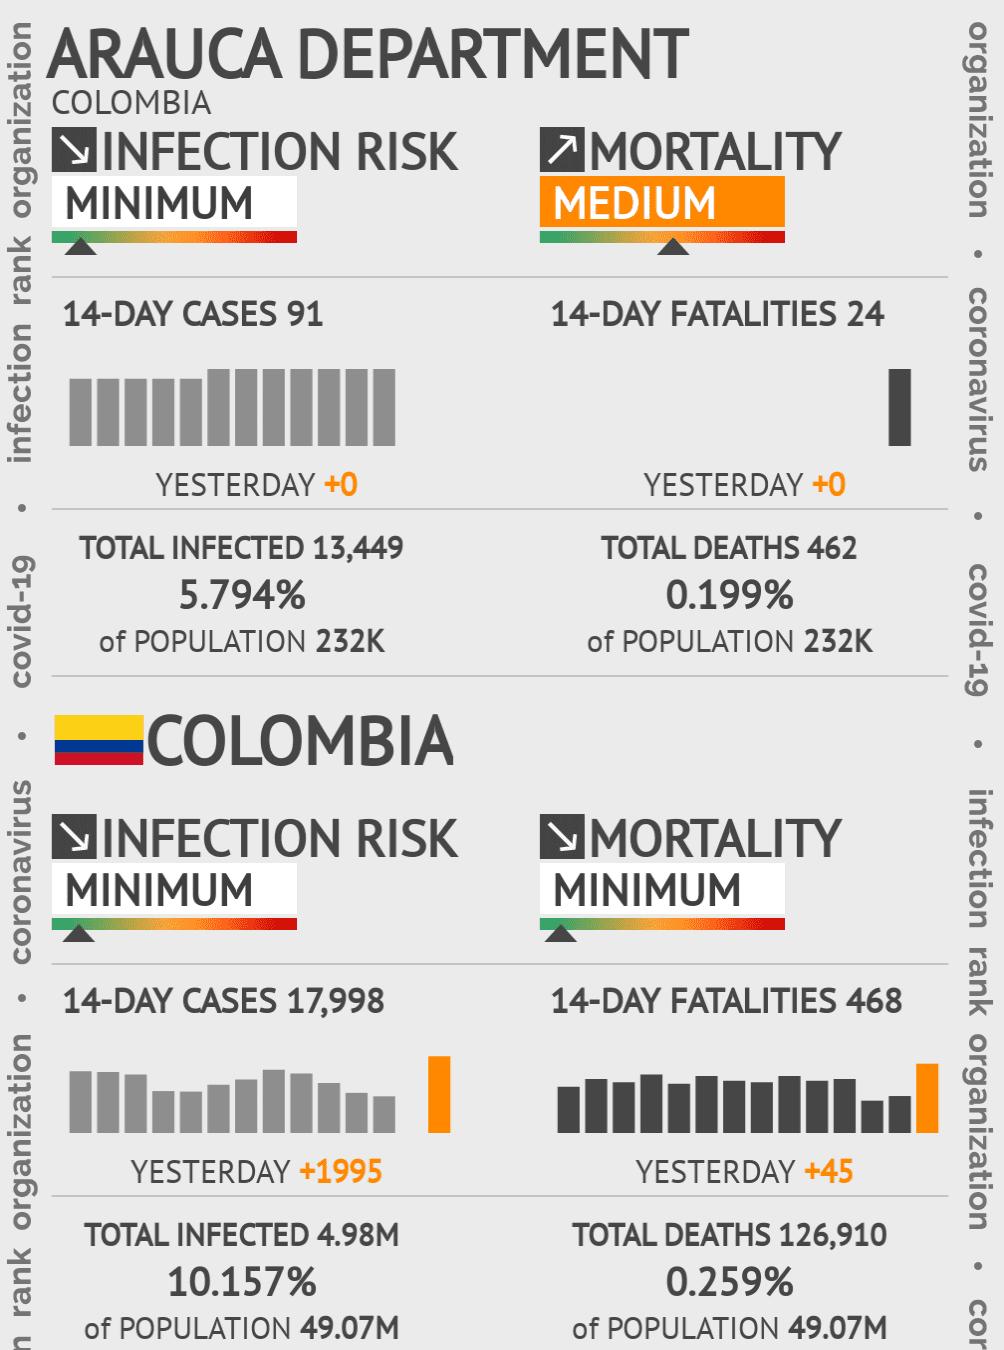 Arauca Coronavirus Covid-19 Risk of Infection on March 06, 2021